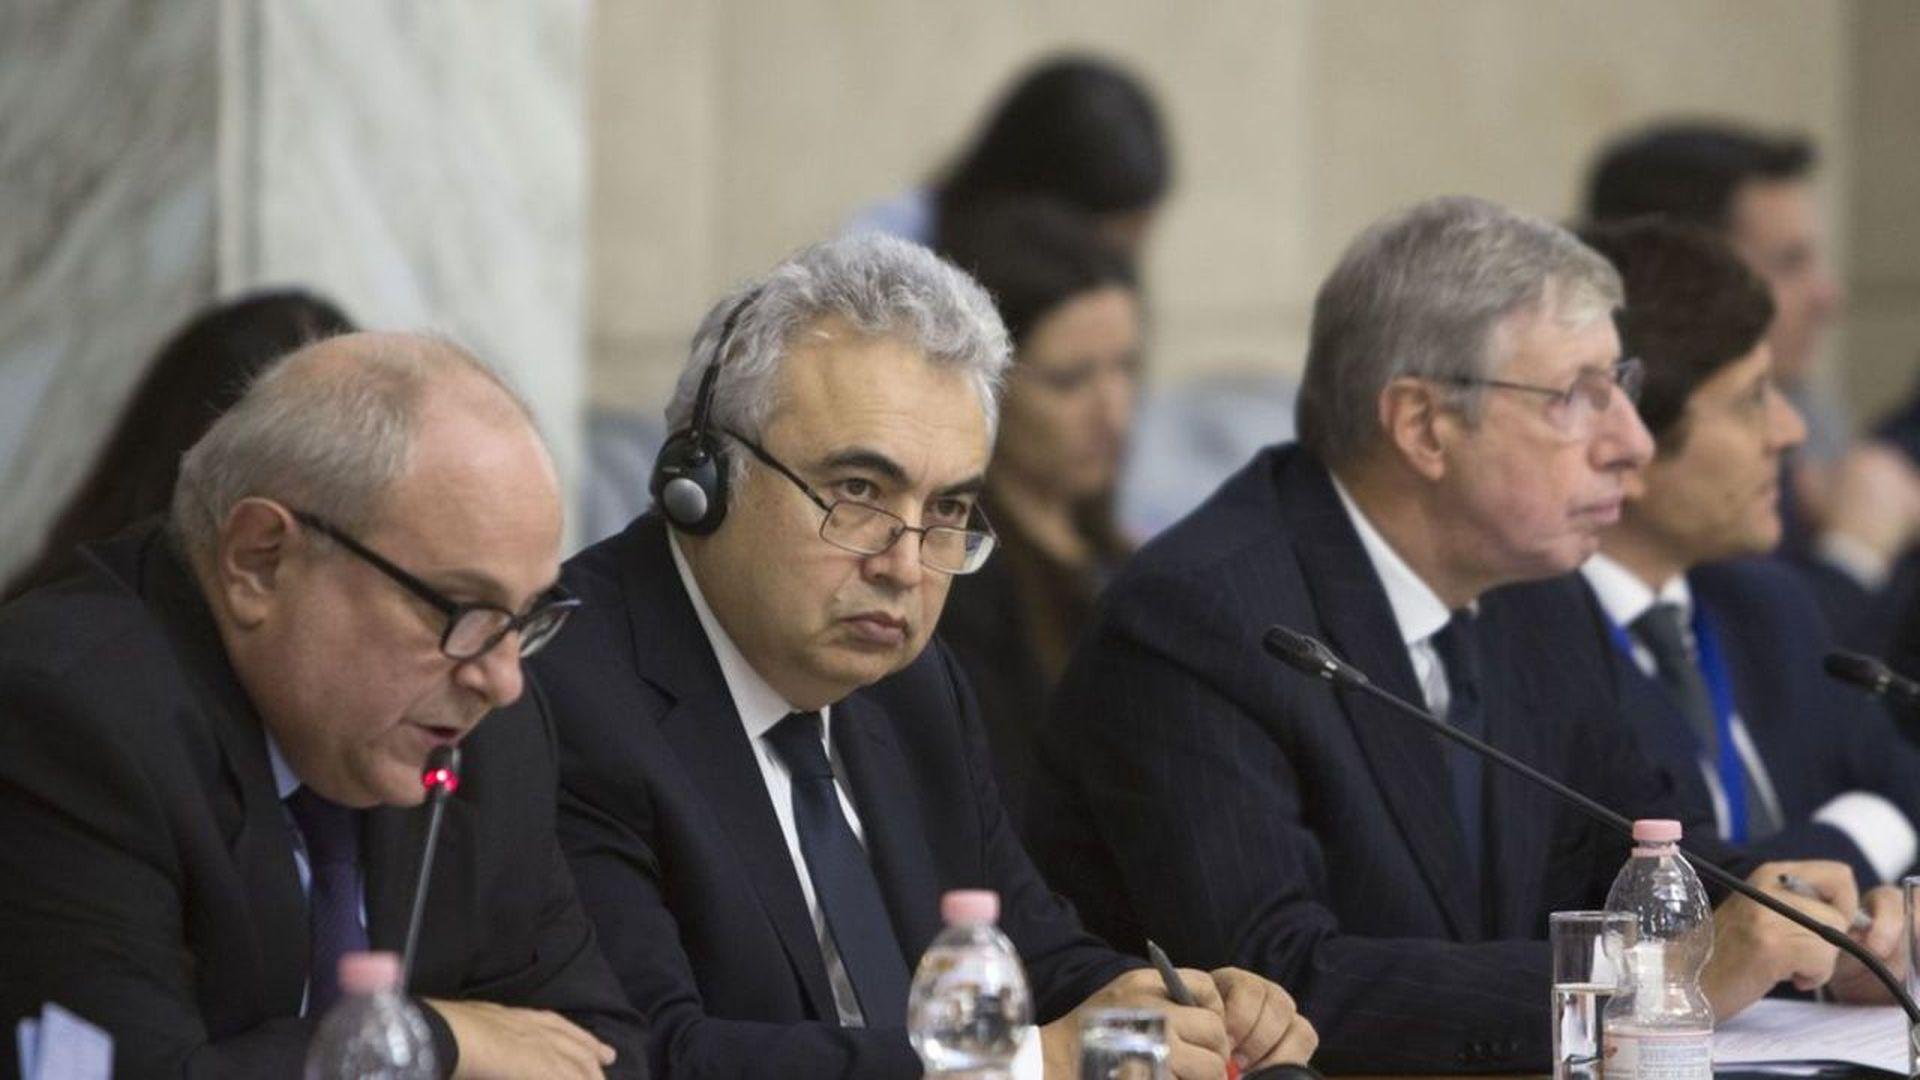 Executive director of the International Energy Agency, Faith Birol (center). Photo: Riccardo De Luca/Anadolu Agency/Getty Images